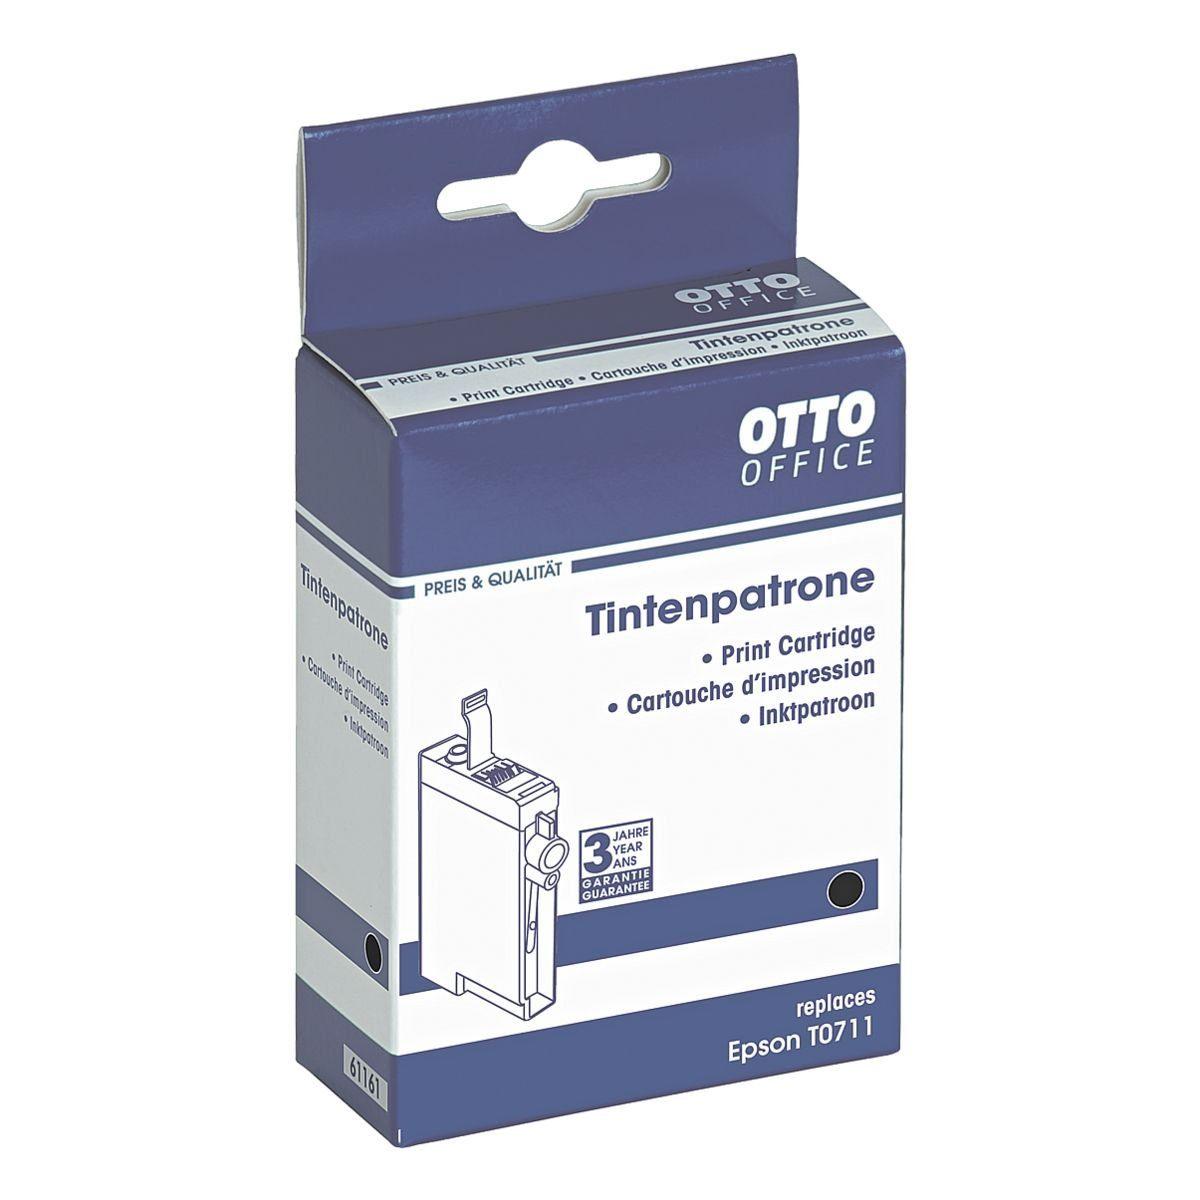 OTTO Office Standard Tintenpatrone ersetzt Epson »T0711«